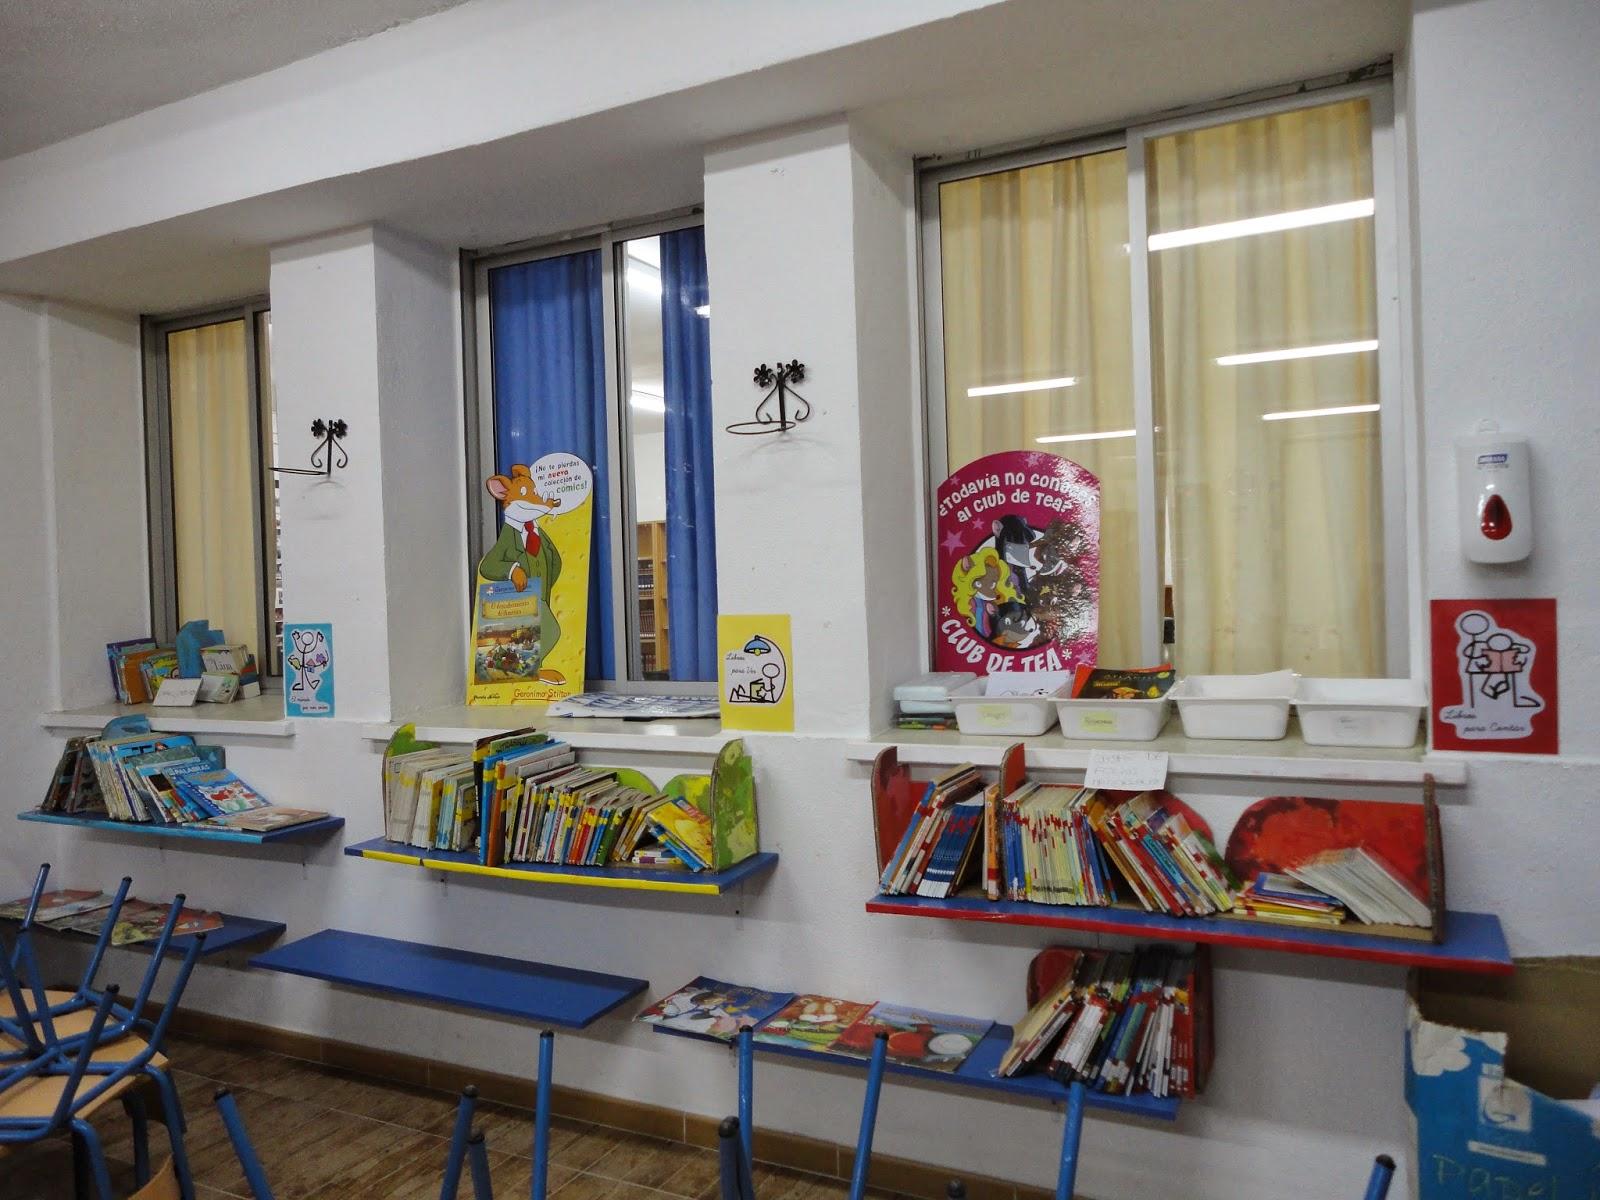 Biblioteca escuelas verdes - Estanteria biblioteca infantil ...